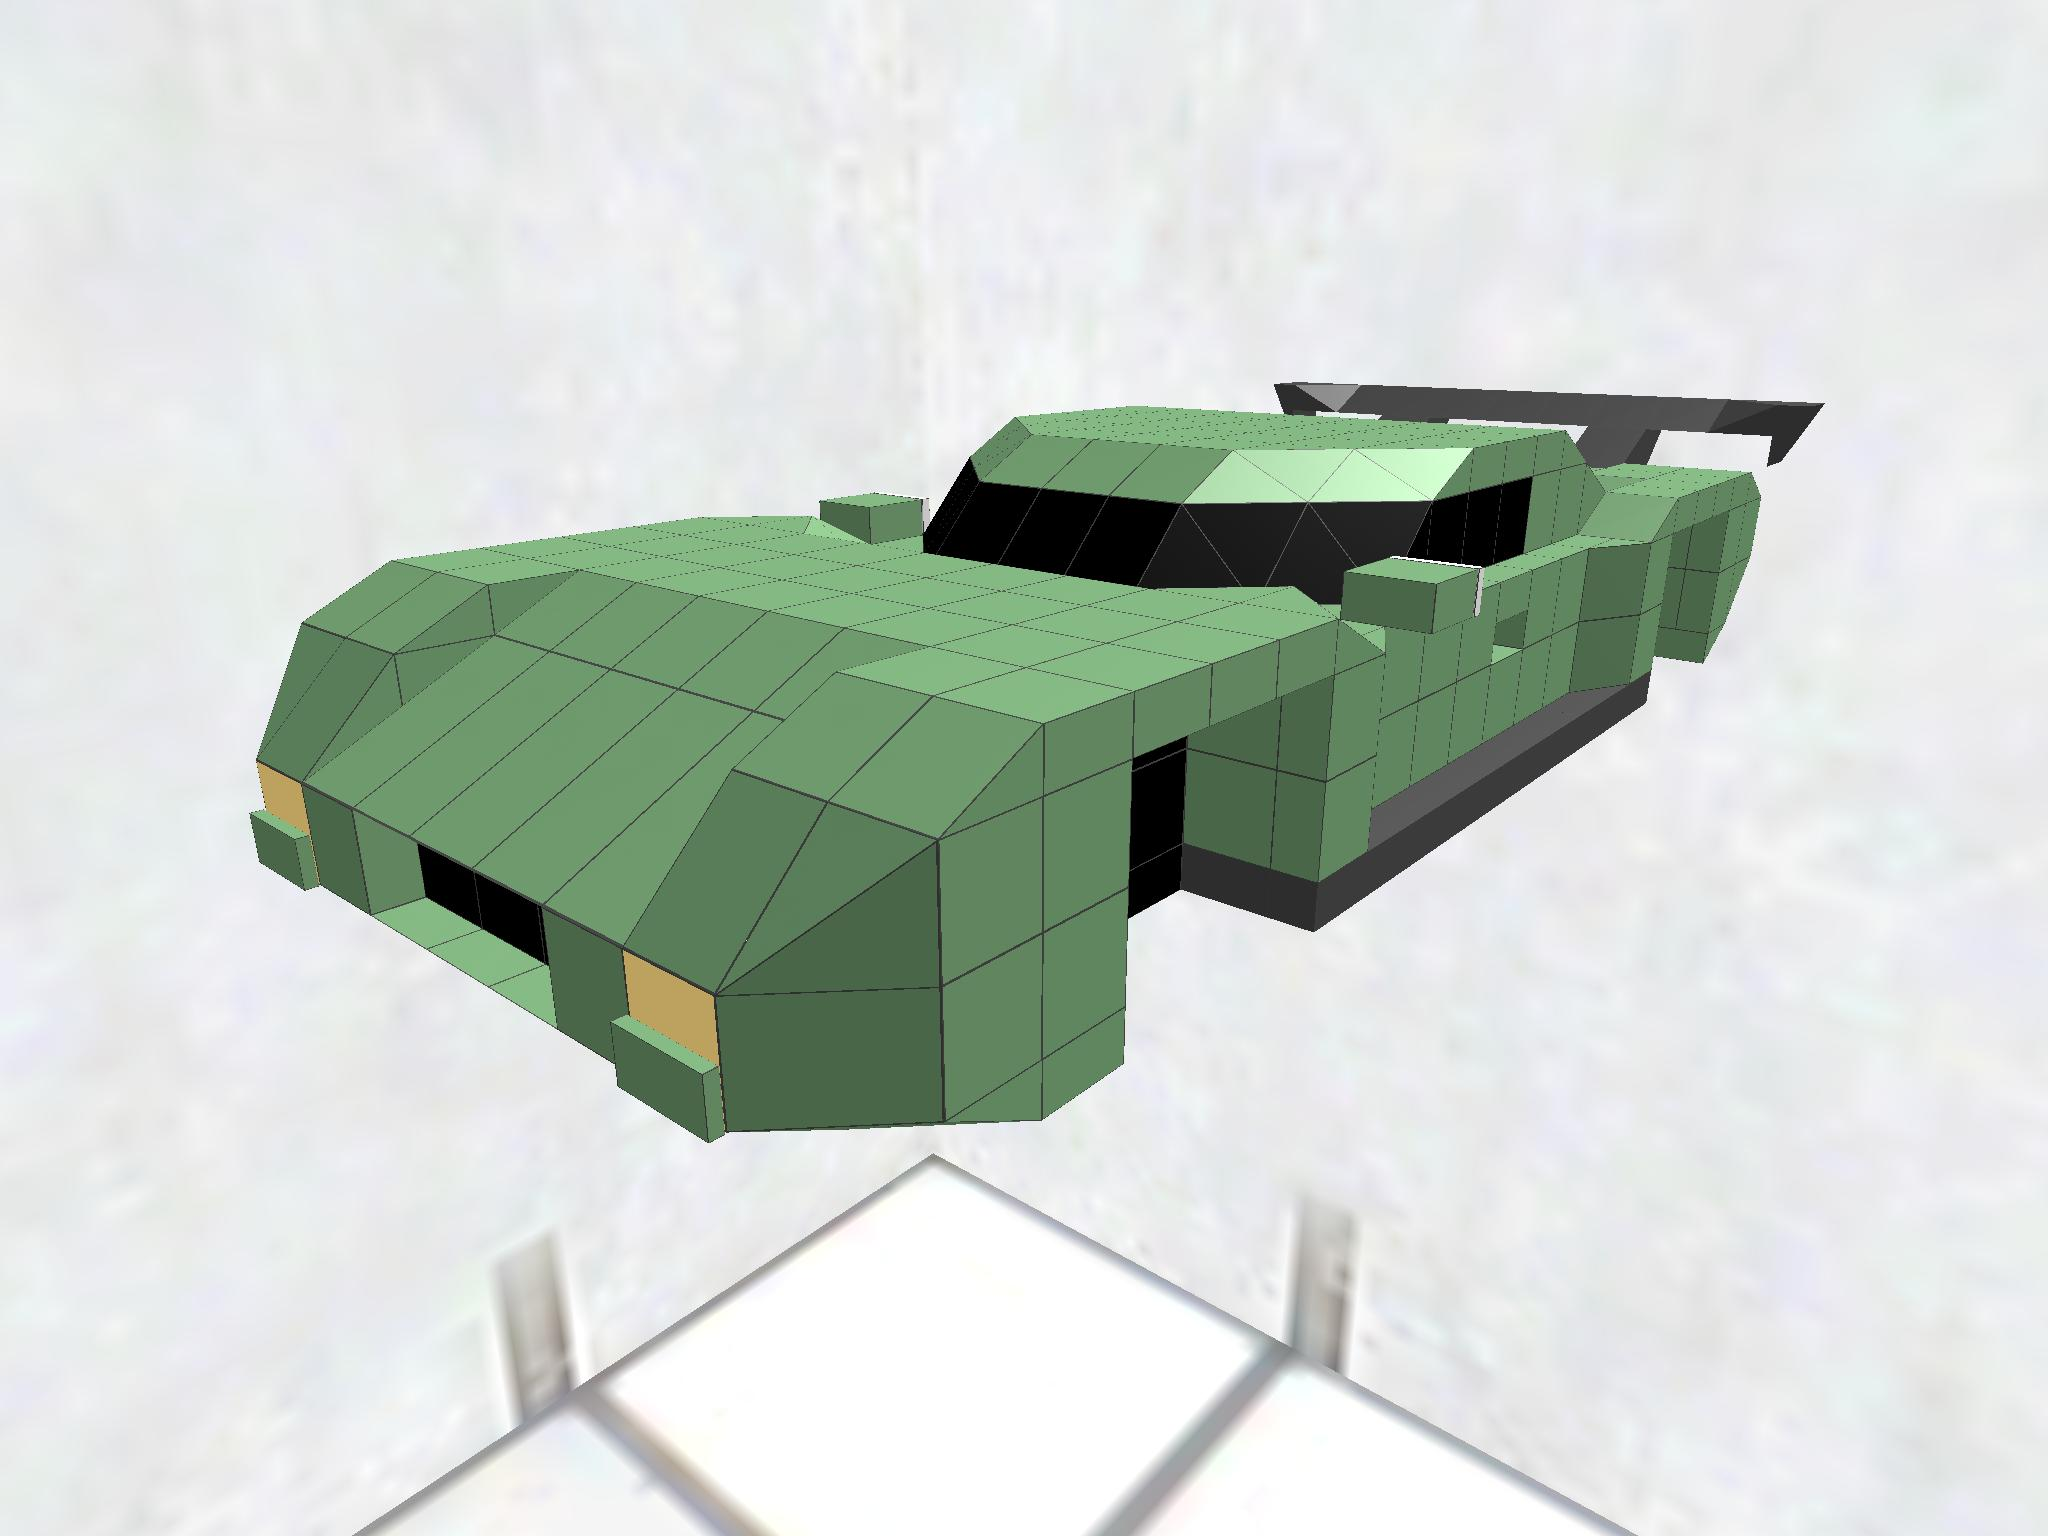 [UPDATED]VecTrec Unity RoadCar